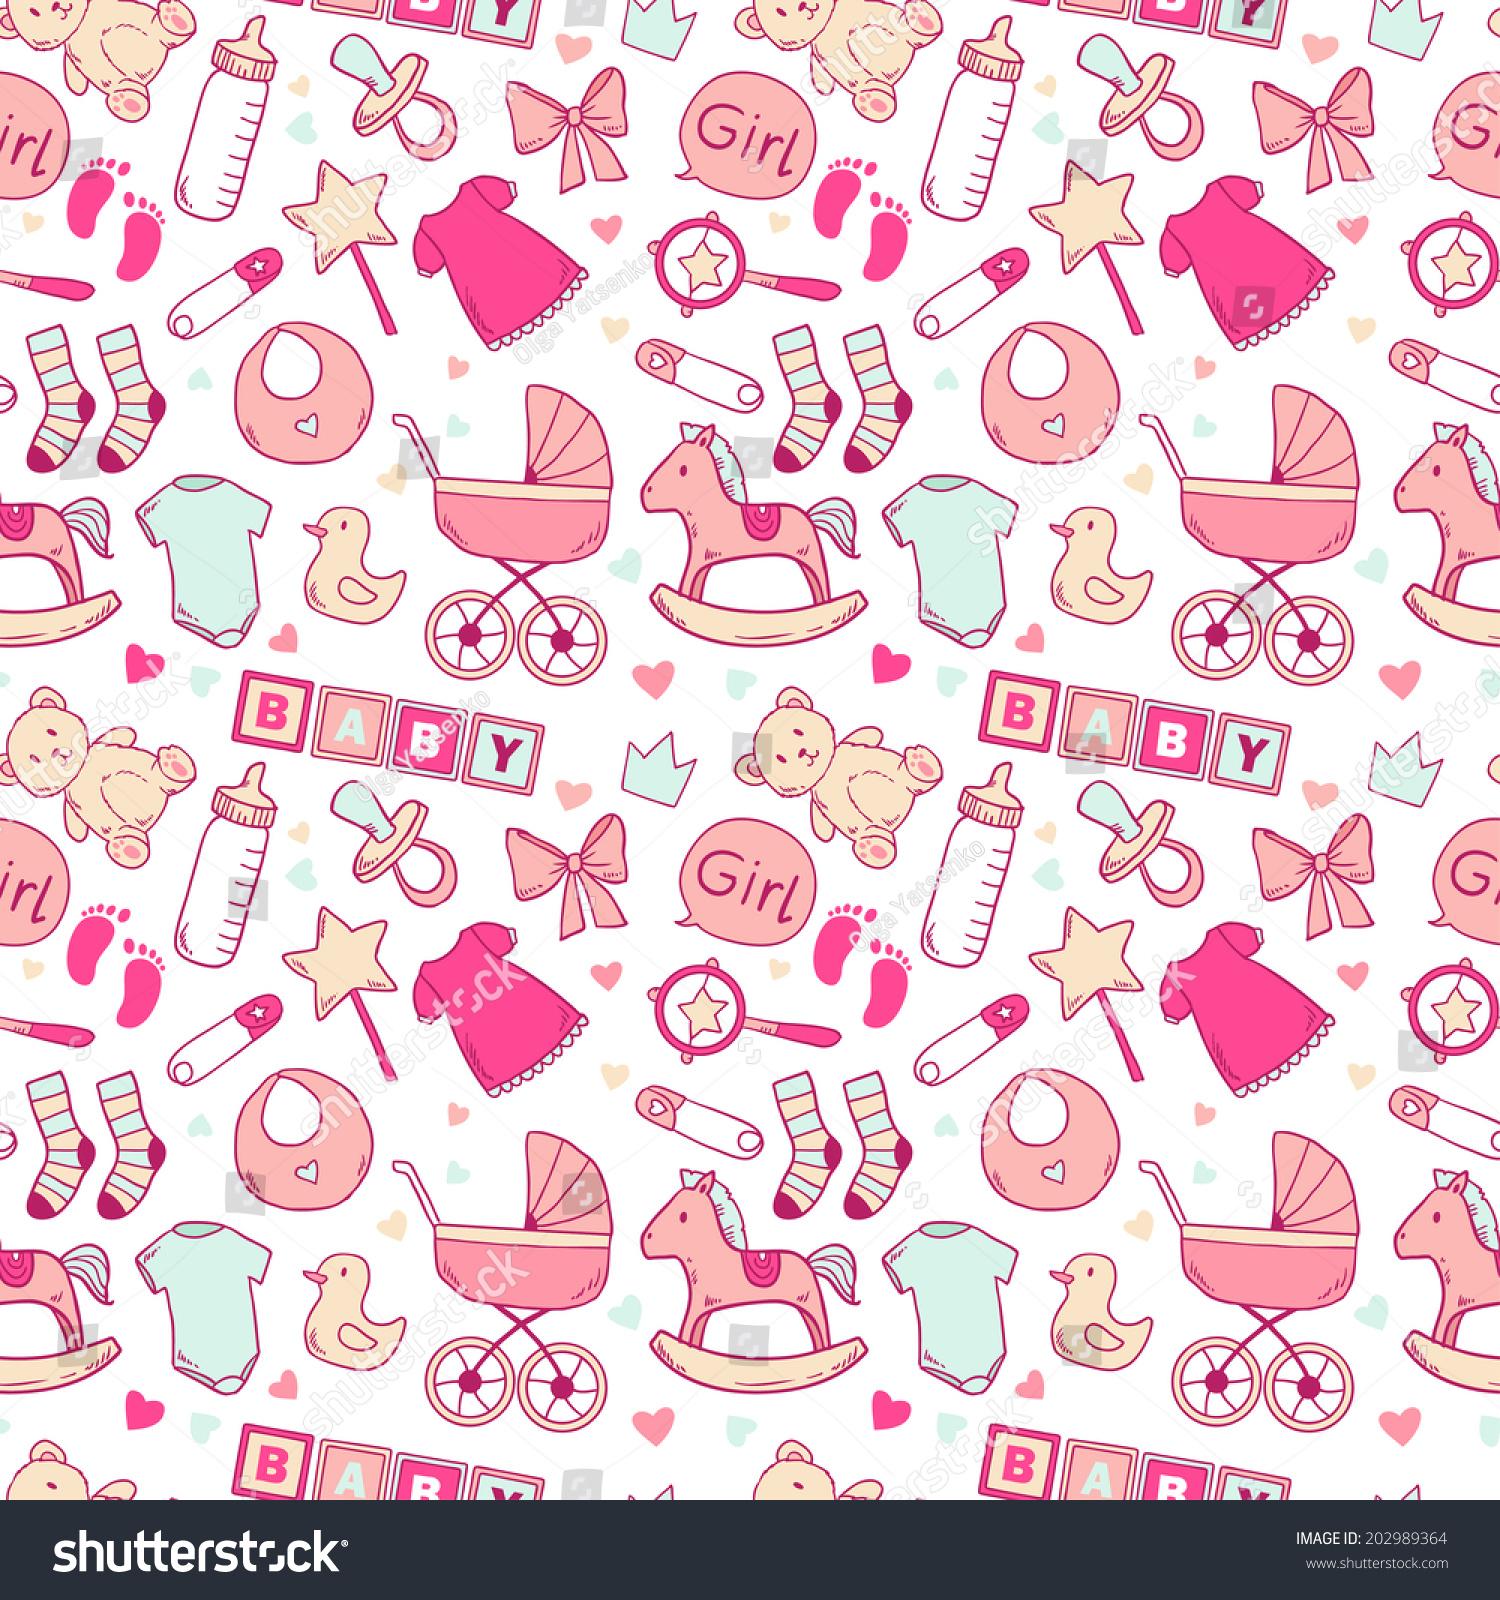 Baby Pattern Interesting Inspiration Design